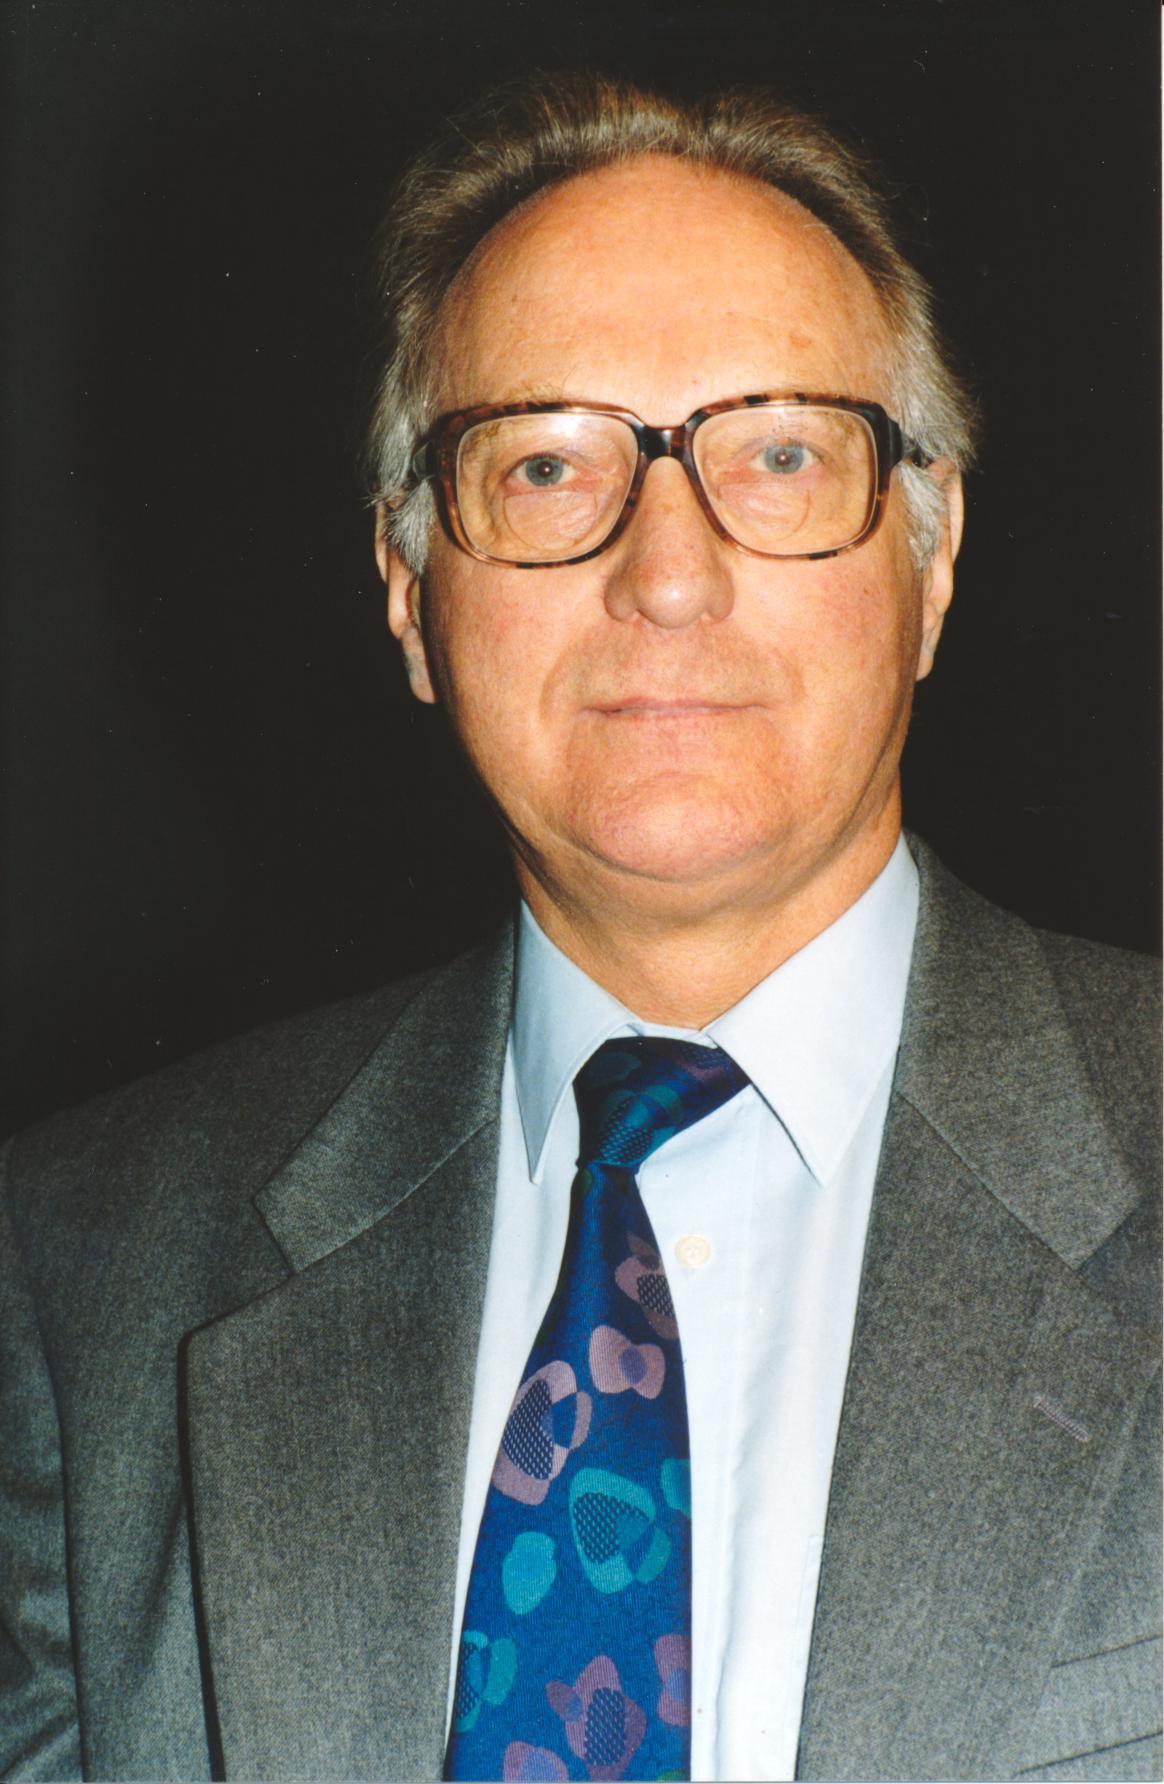 XV. Imago Mundi-Kongress 1995, Innsbruck, Prof. Dr. Erlendur Haraldsson